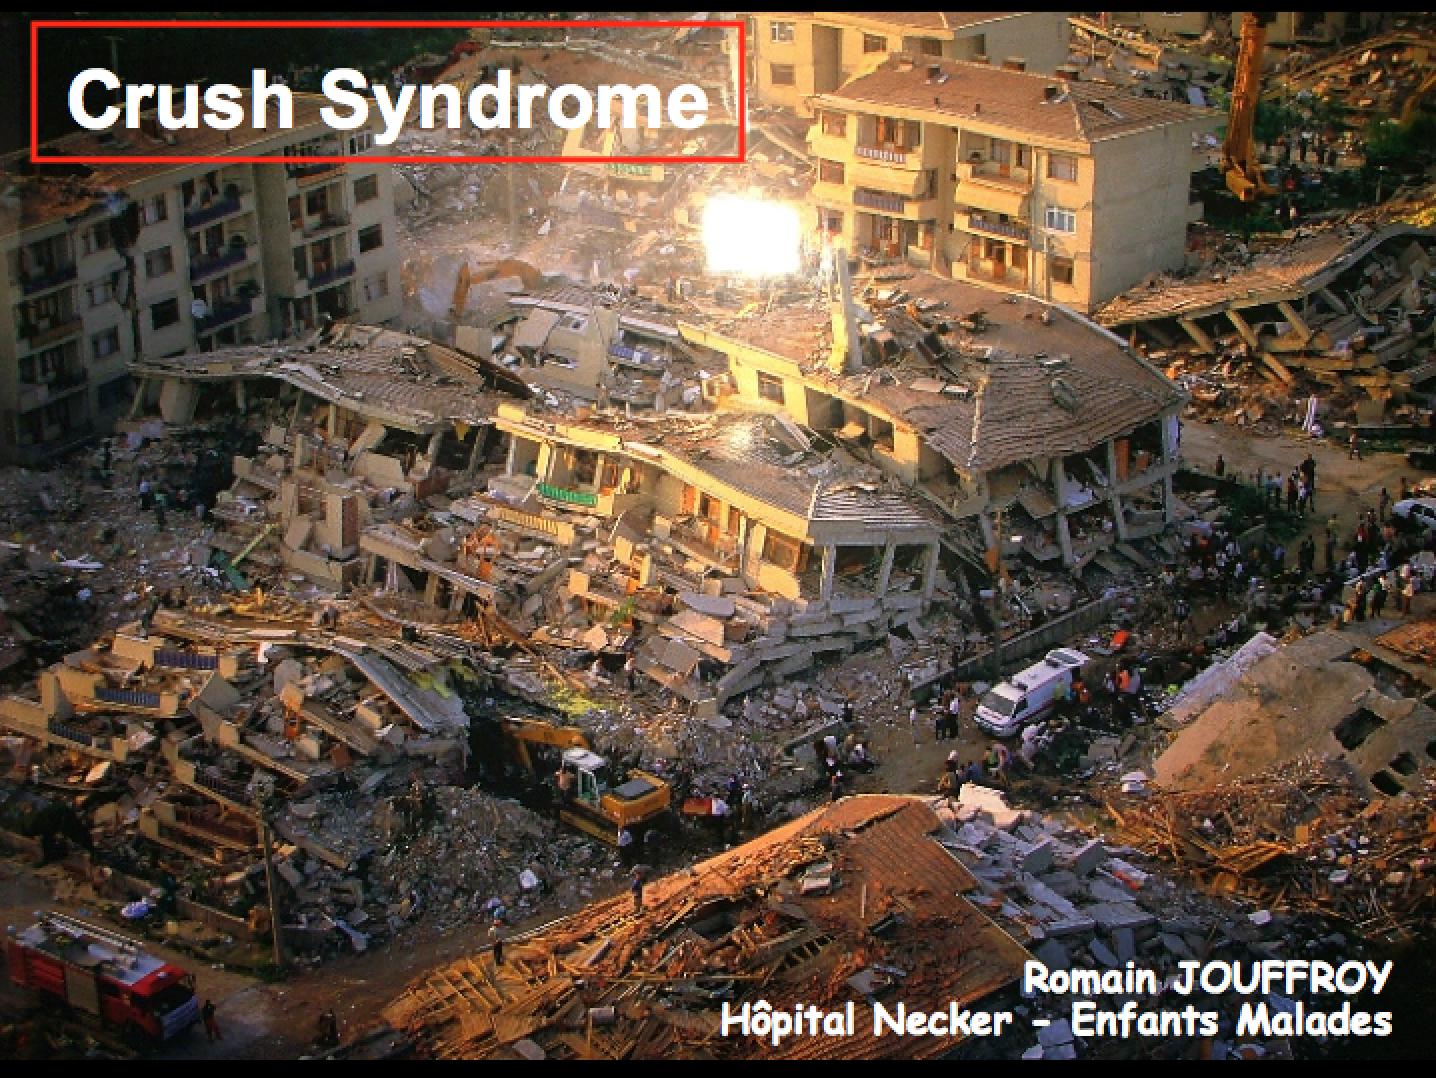 Crush Syndrome and Hyperkalemia